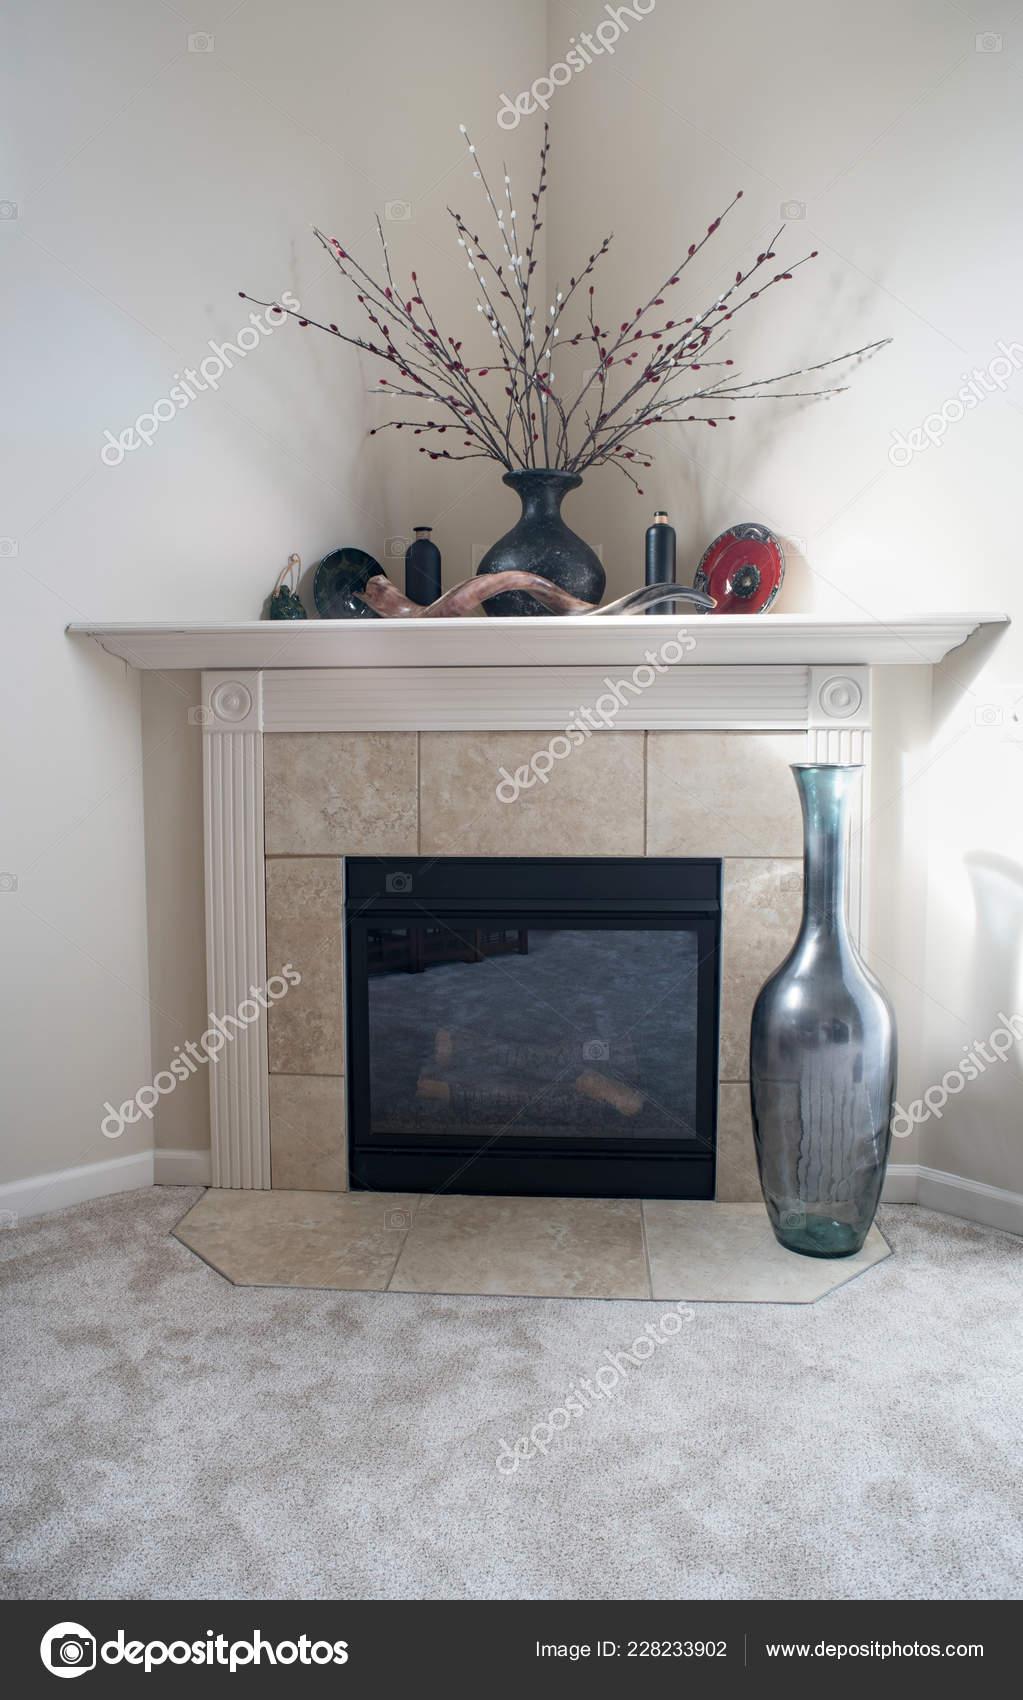 Pictures Corner Fireplace Decorating Ideas Corner Fireplace Bottle Decor Stock Photo C Lawcain 228233902